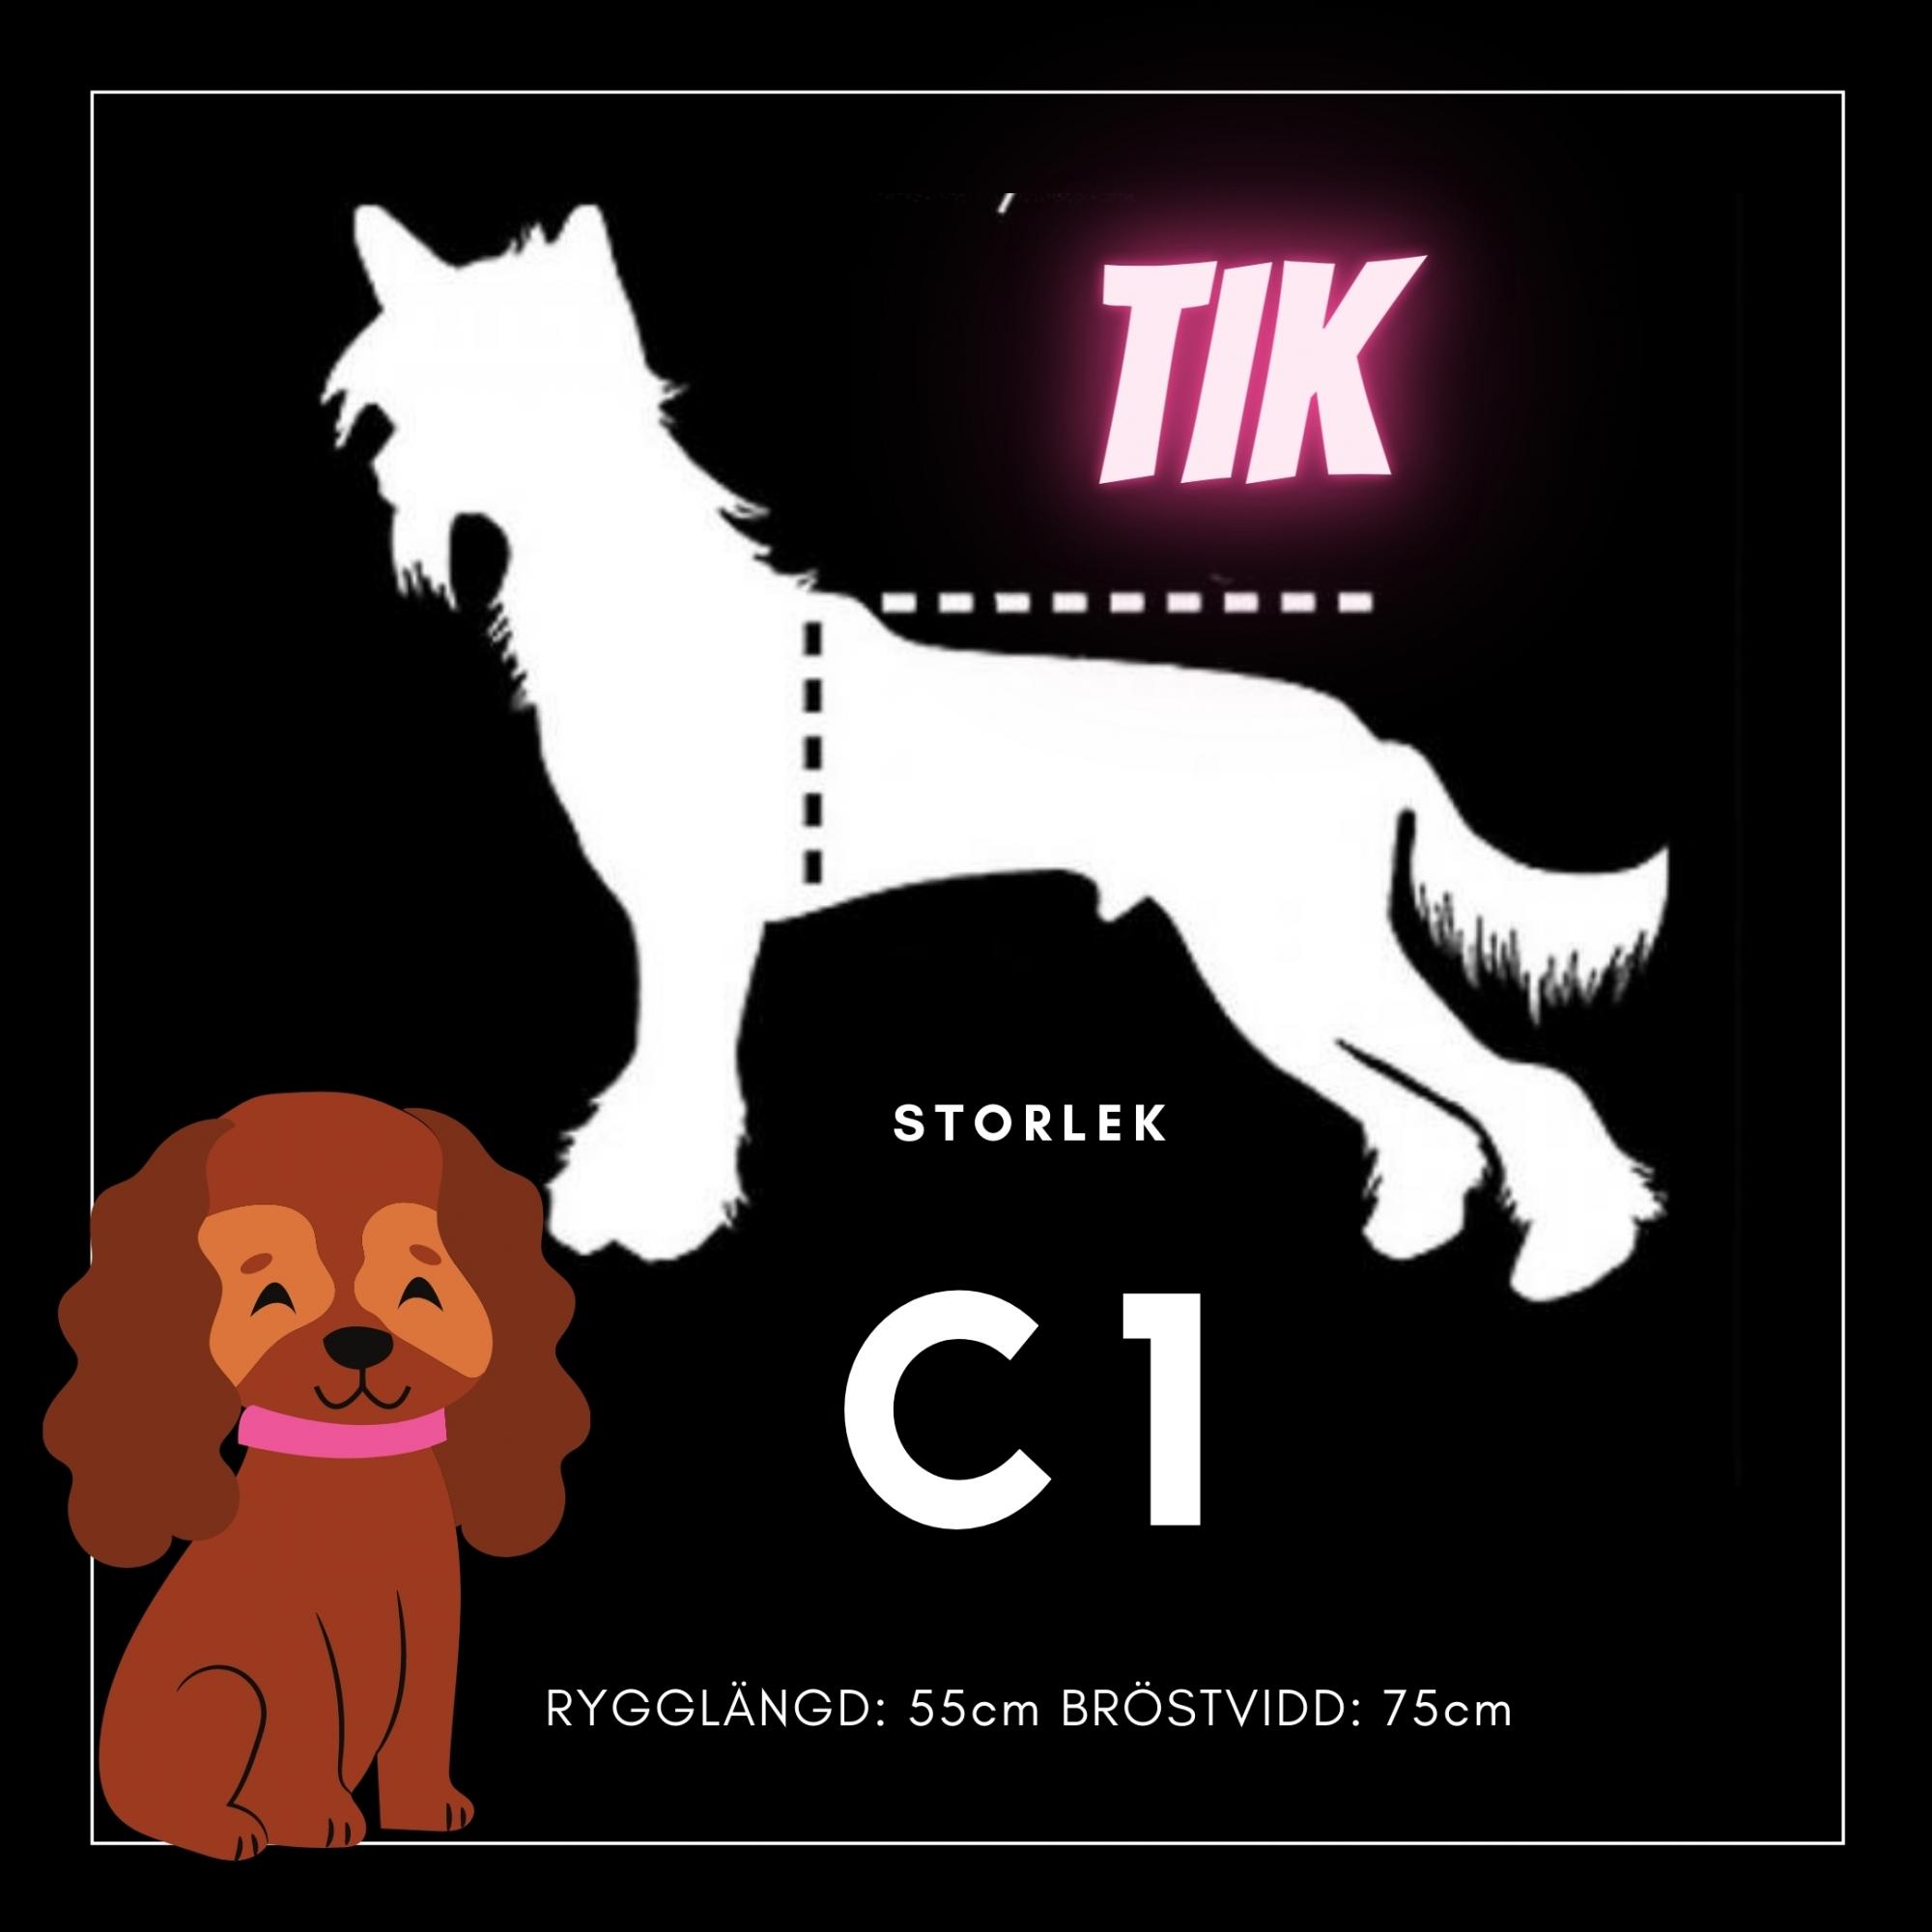 Tik Storlek C1 - Passion For Pet Fashion